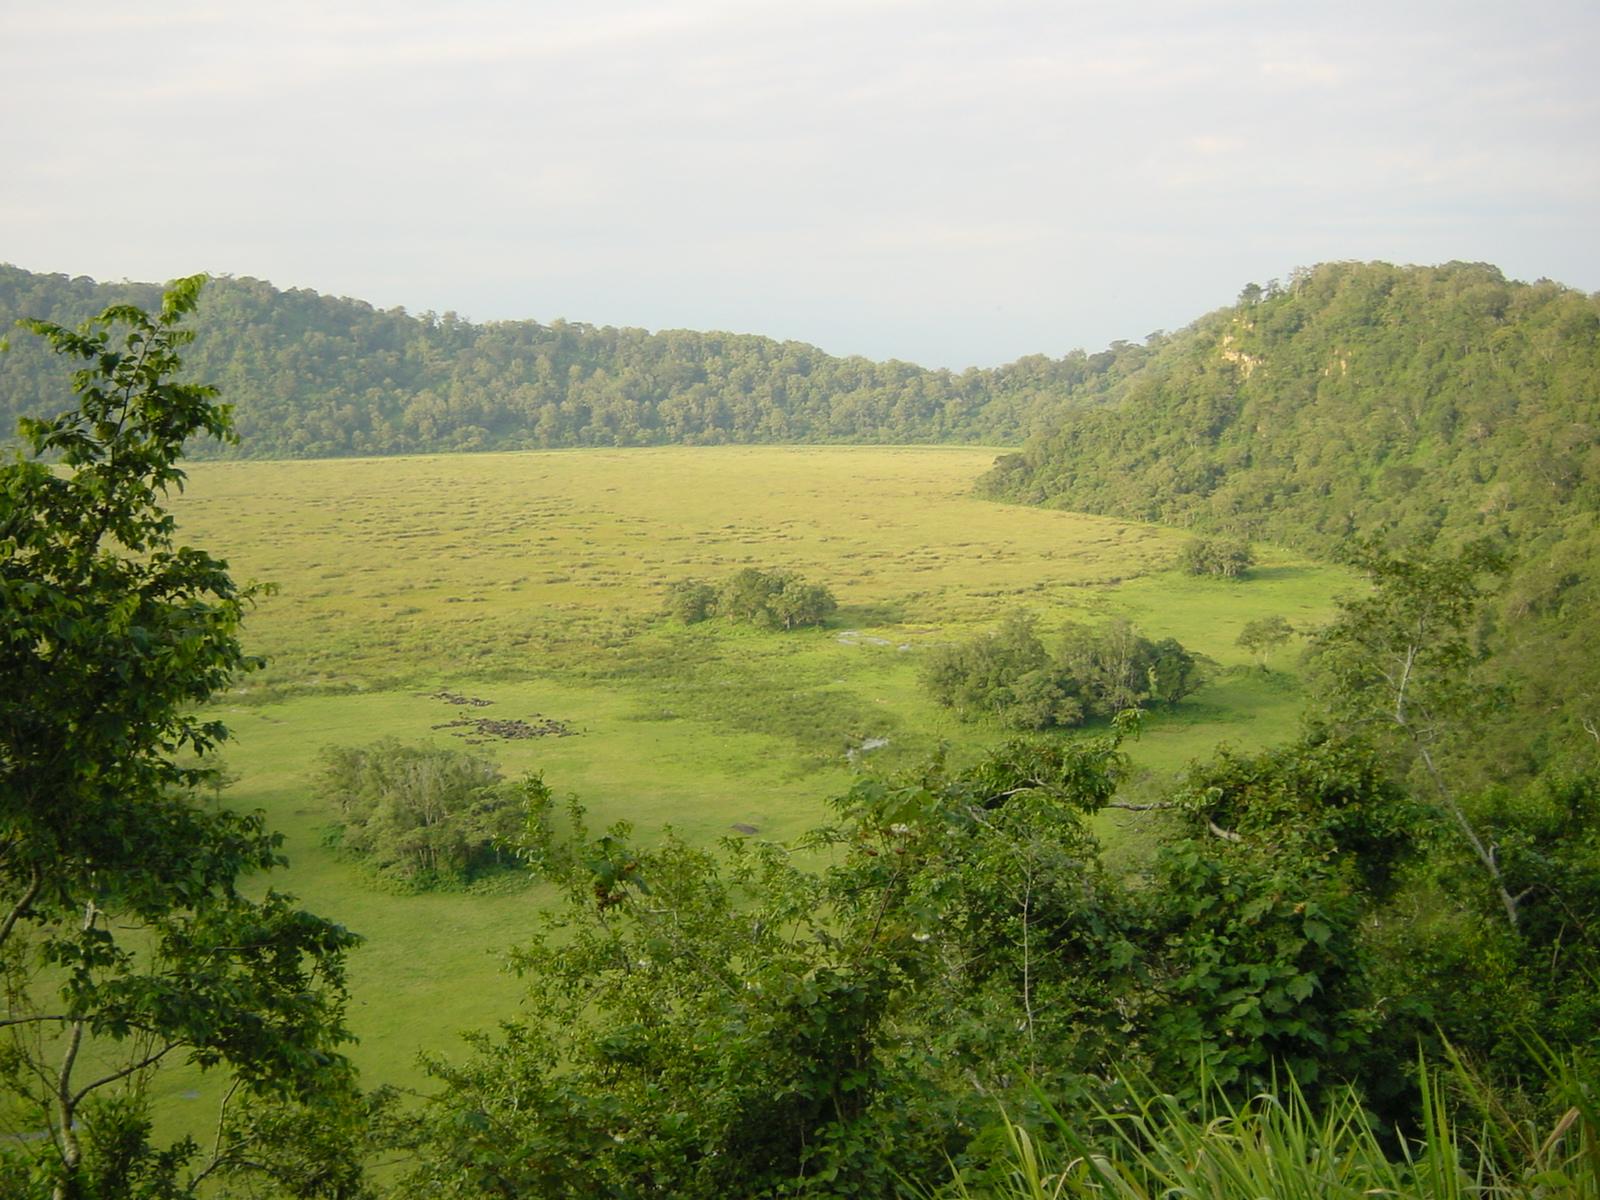 Parque Nacional de Arusha (Tanzania)